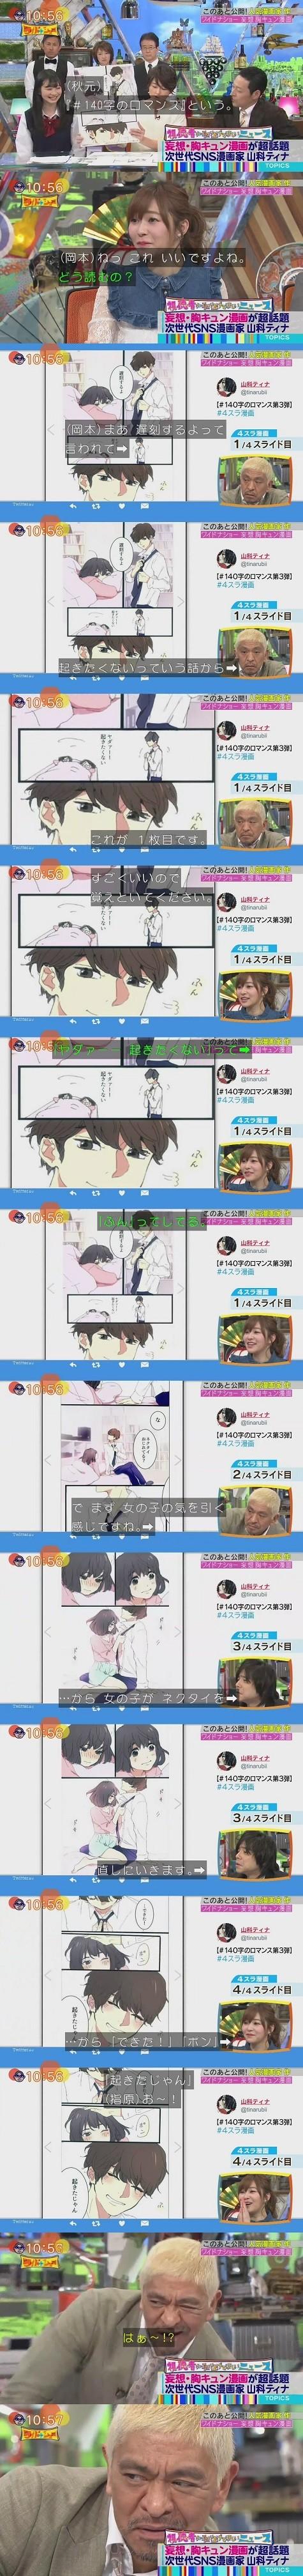 SNS漫画家 山科ティナ 『140字のロマンス』